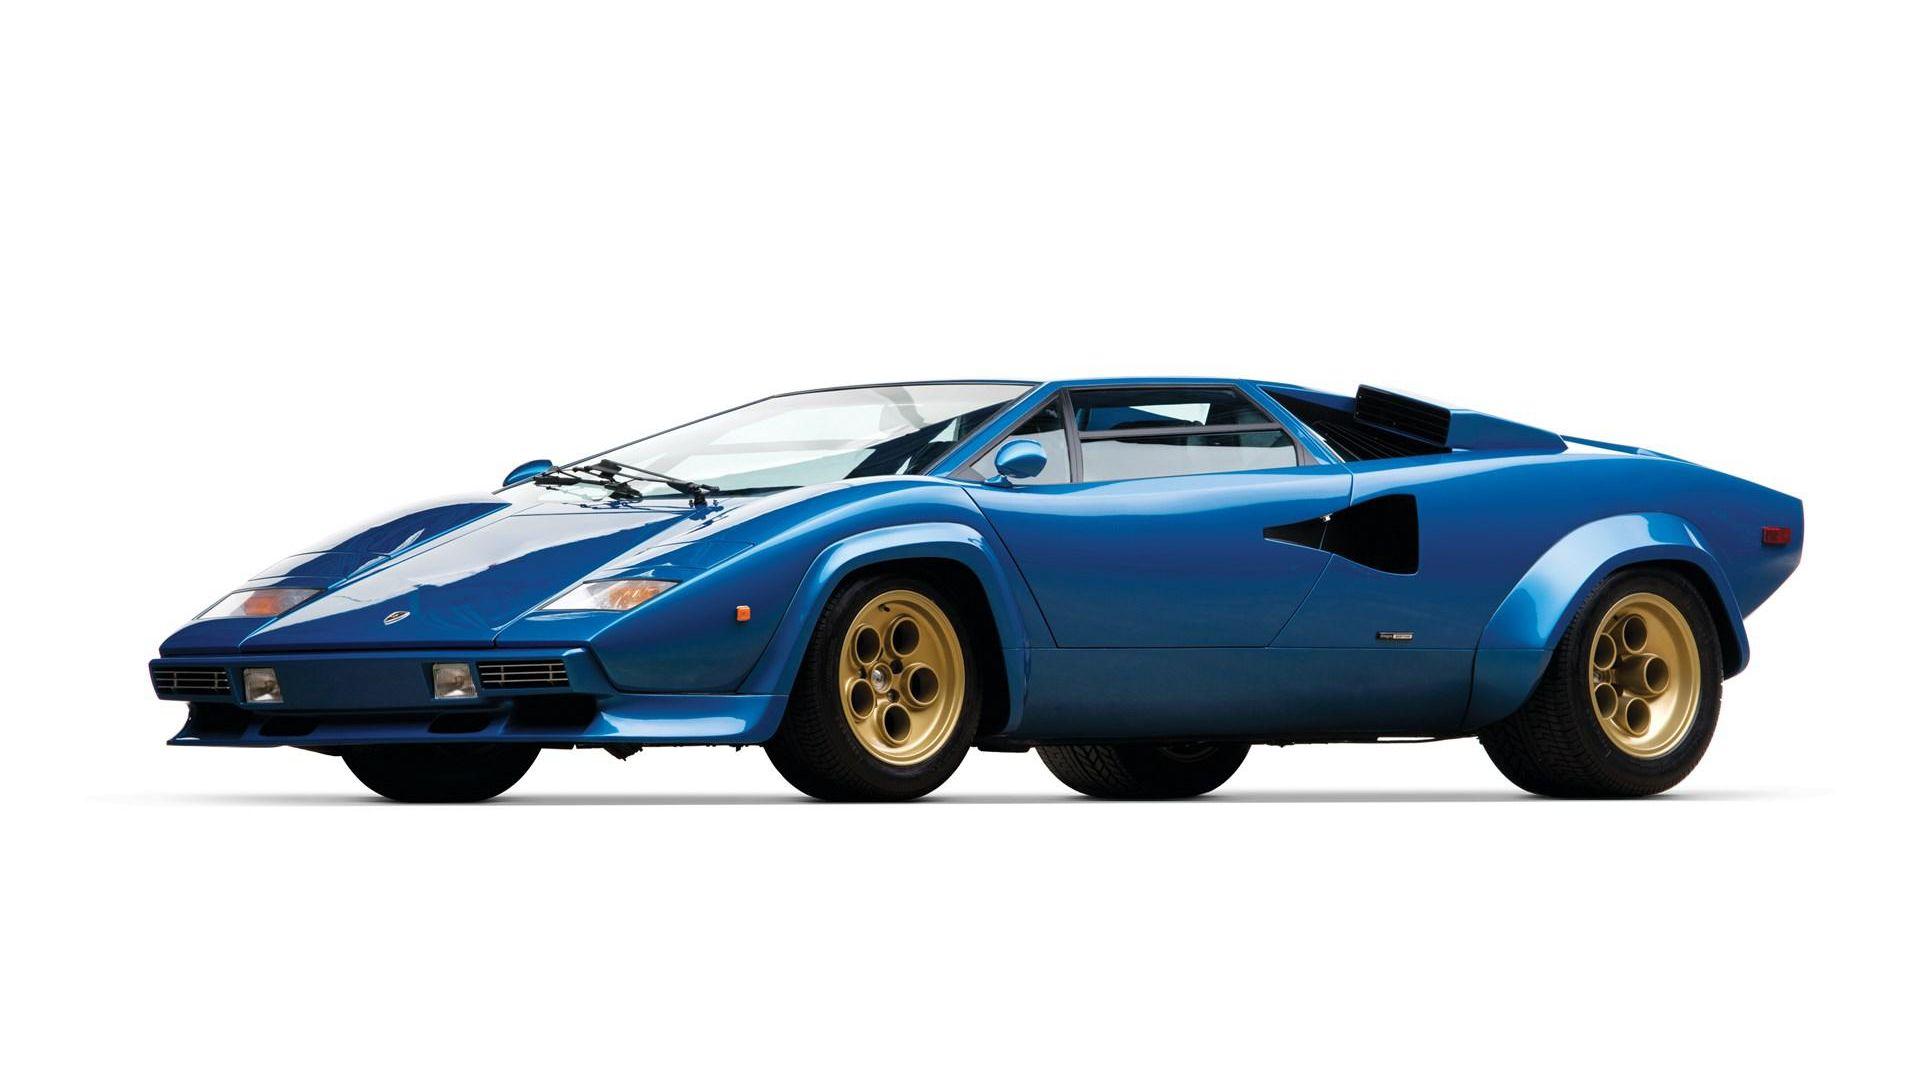 1979 Lamborghini Countach Lp 400S Series I